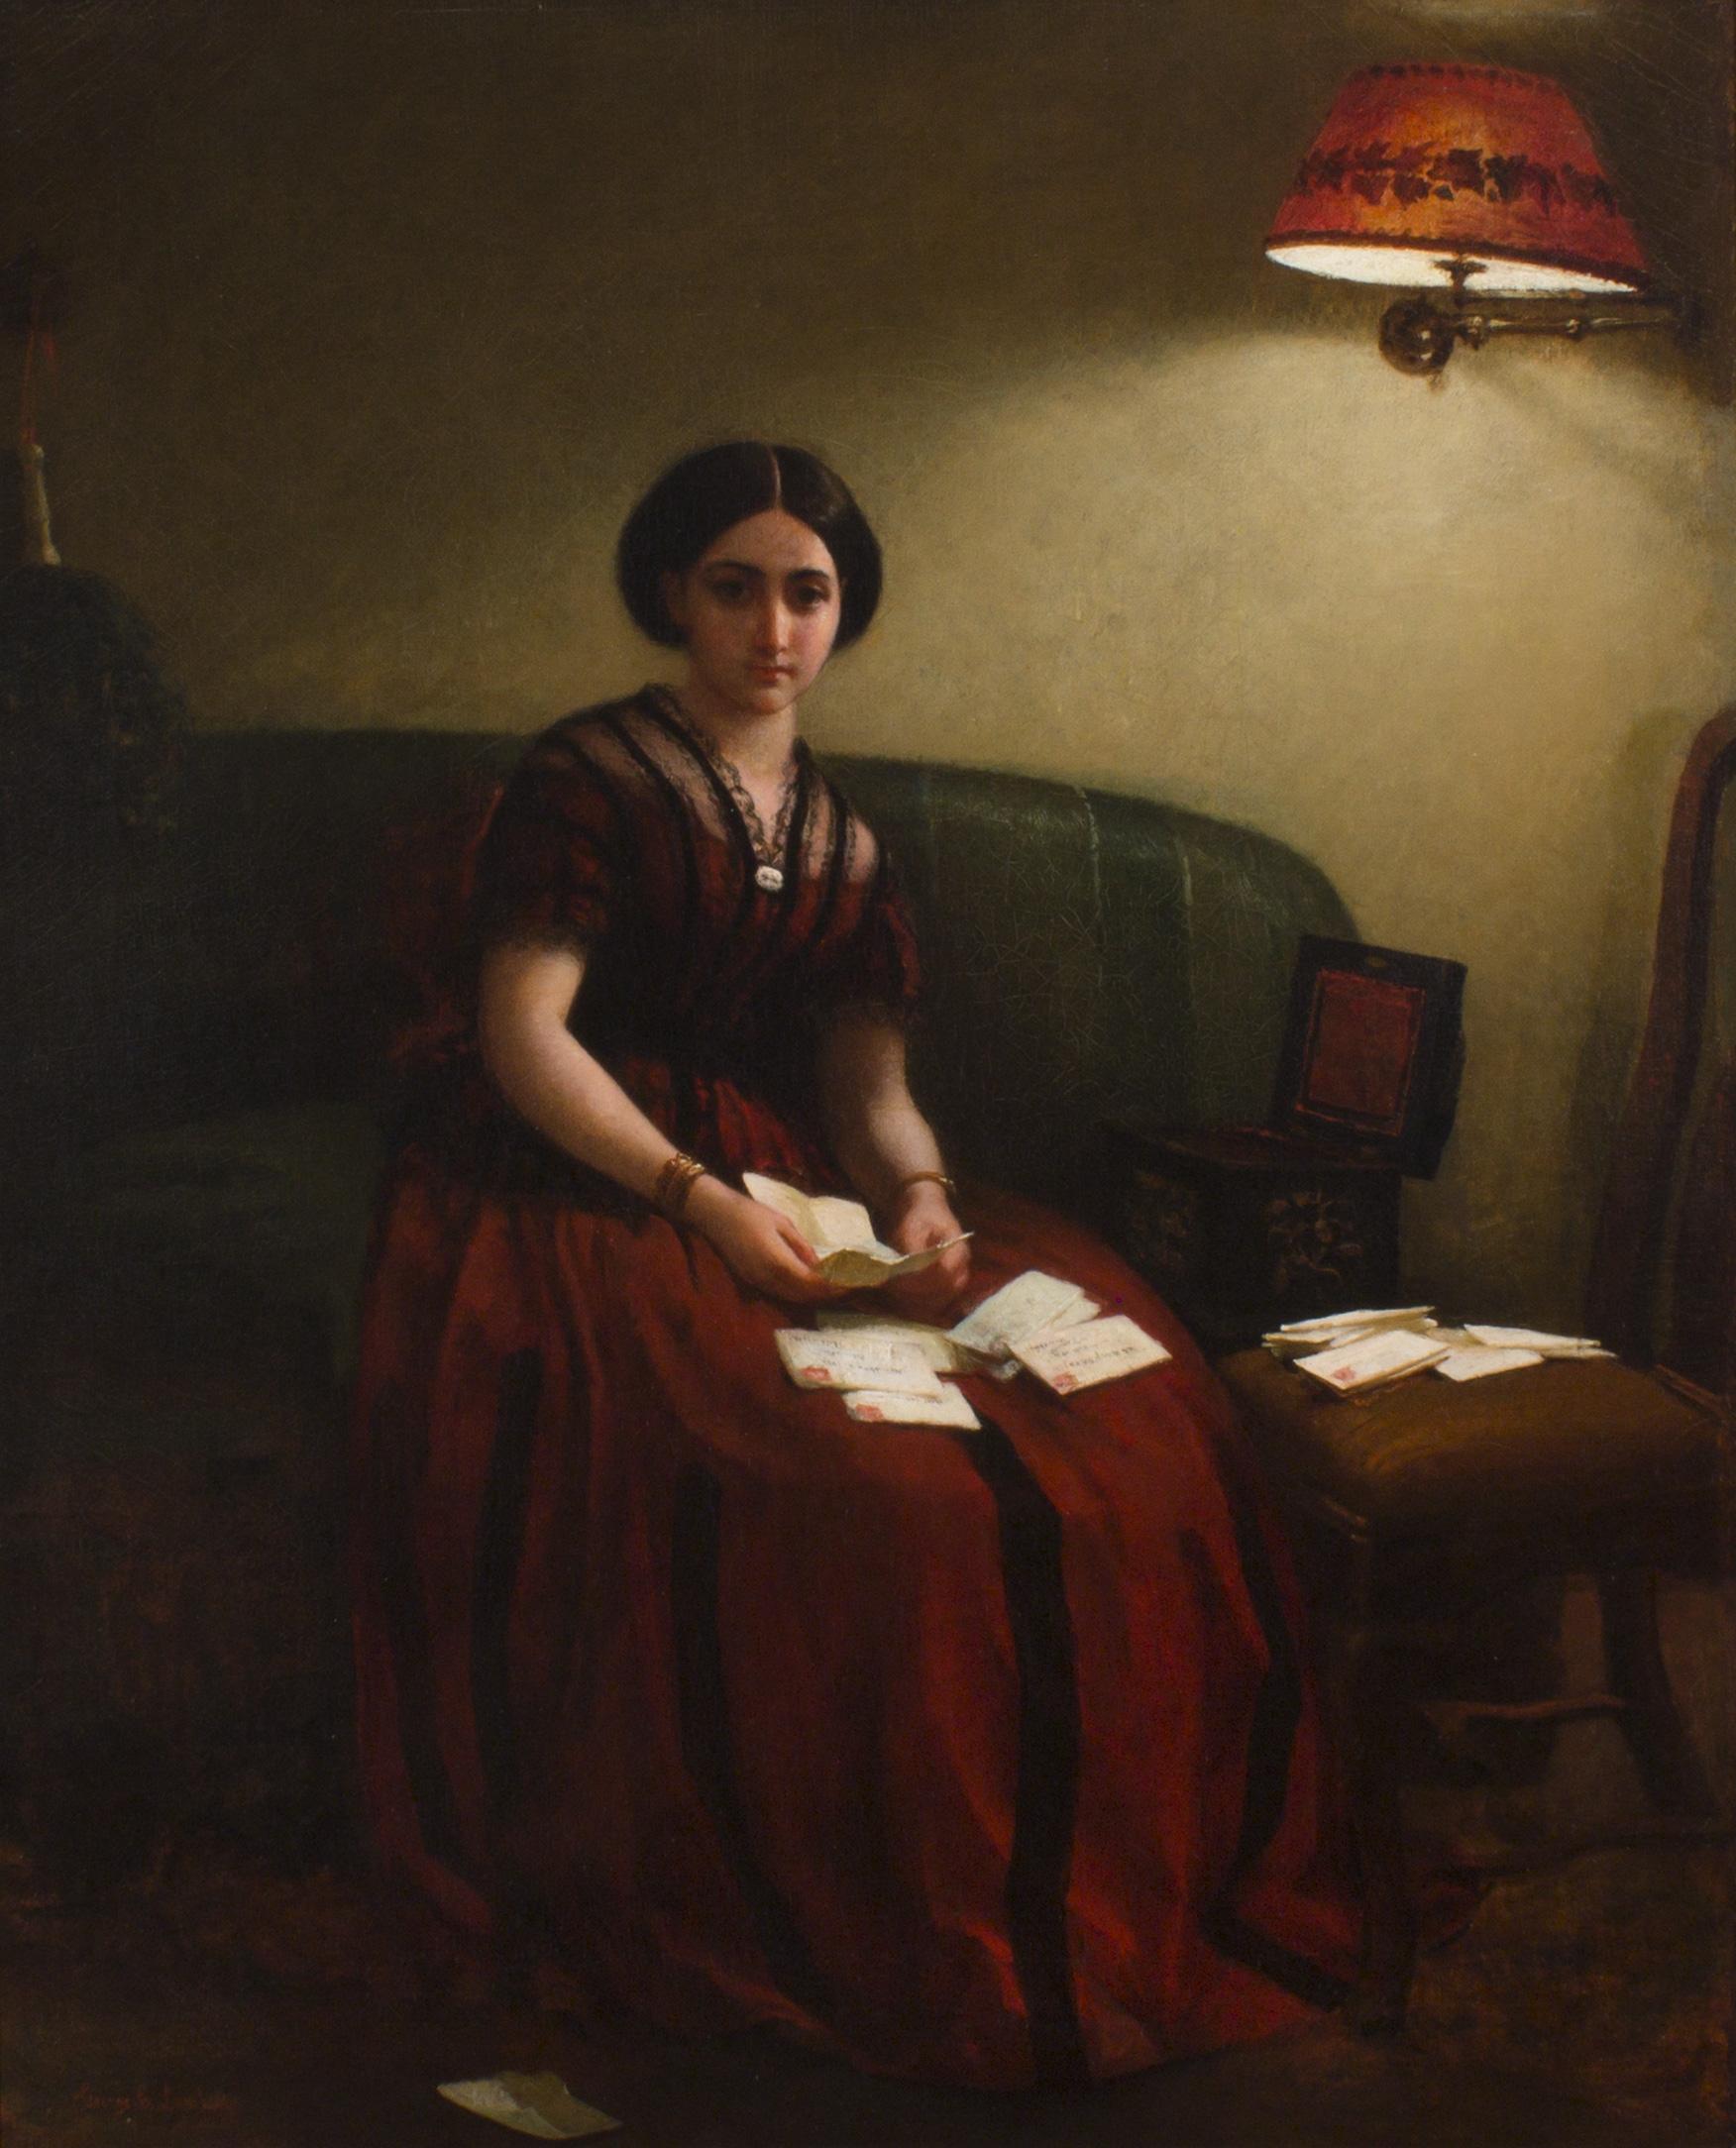 Woman on Sofa Reading Letters (George Cochran Lambdin)